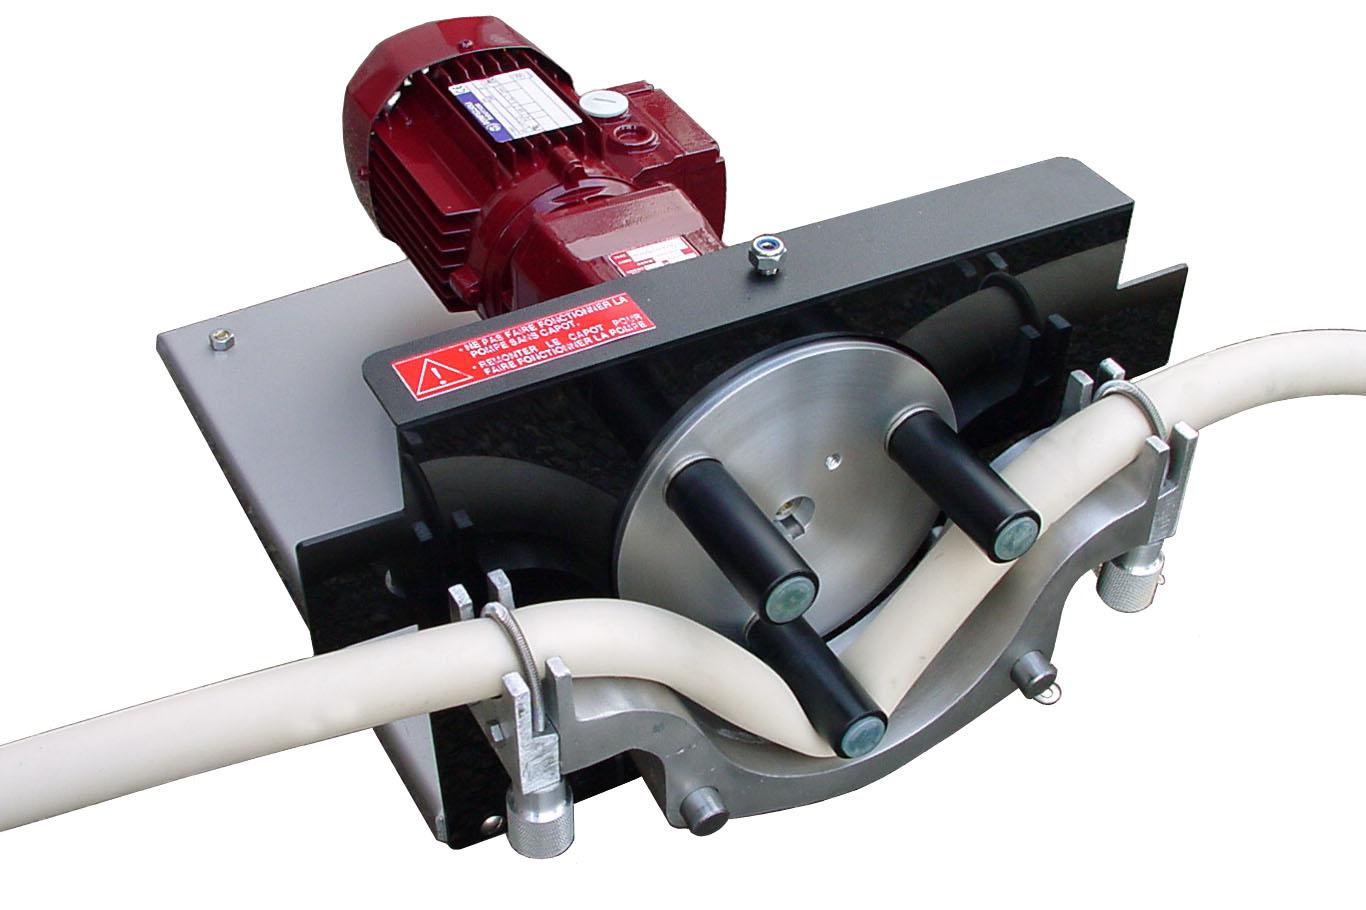 pompes hydrauliques peristaltiques tous les fournisseurs pompe peristaltique liquide pompe. Black Bedroom Furniture Sets. Home Design Ideas